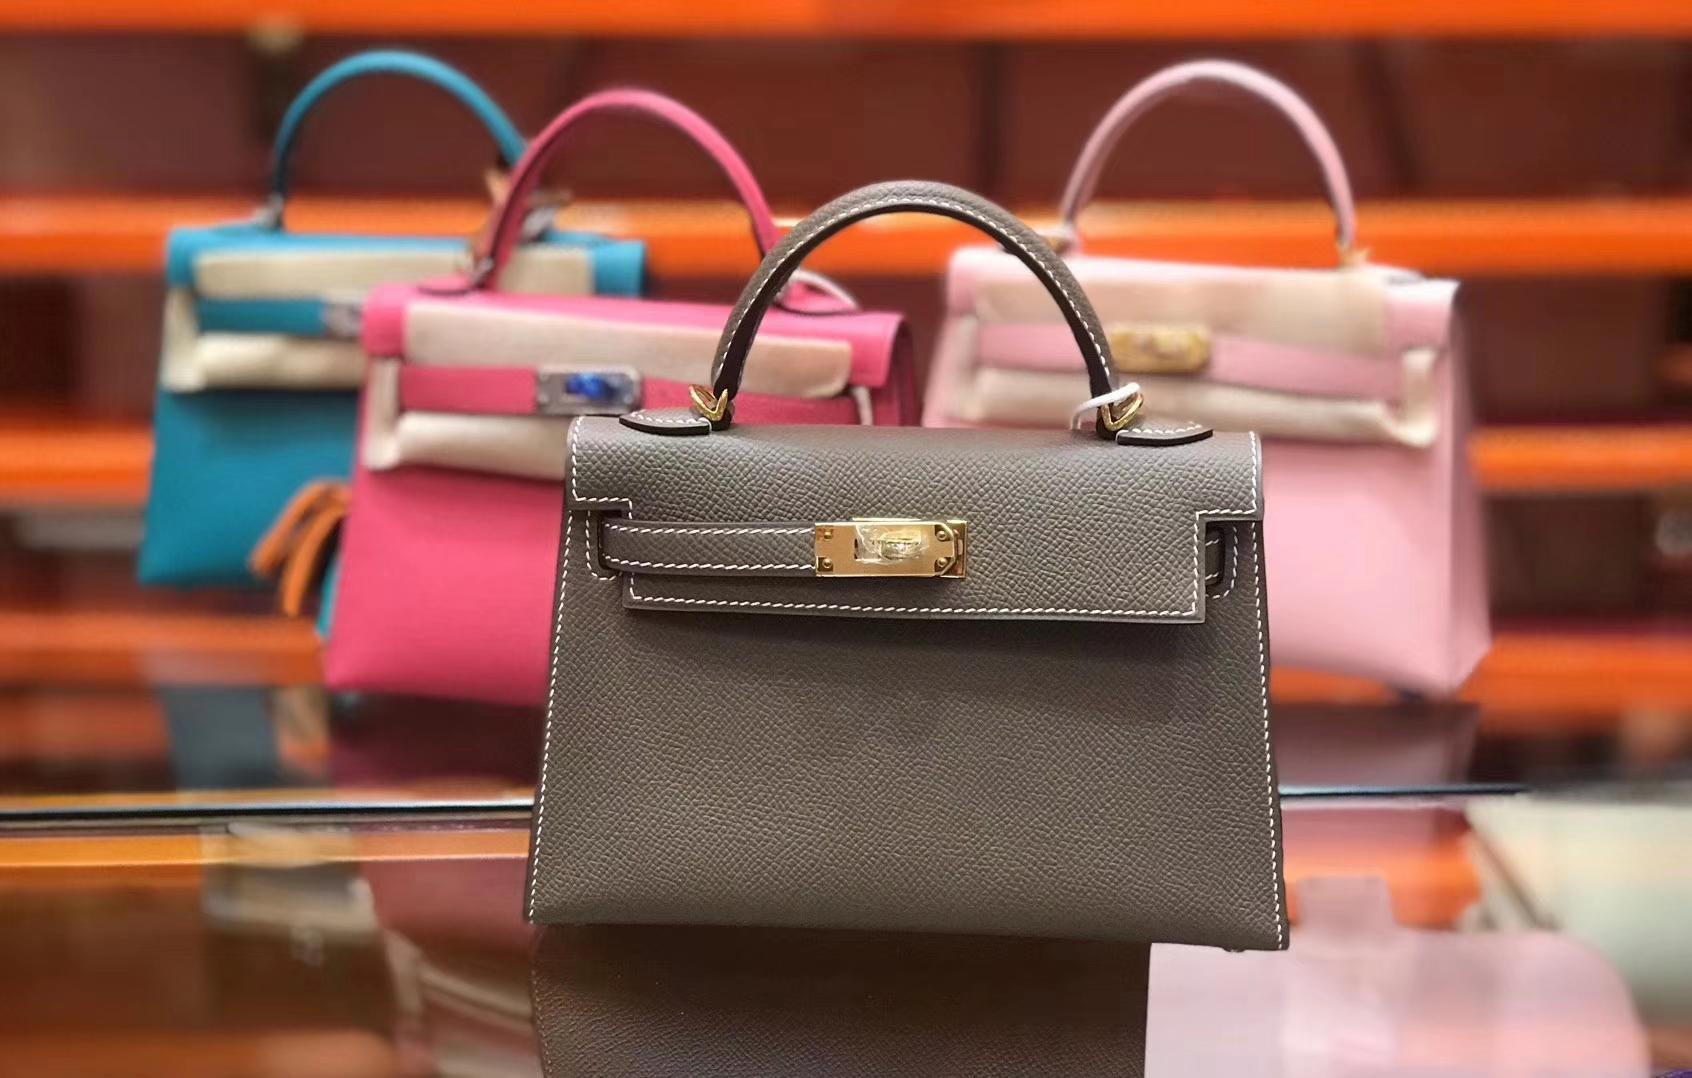 Hermès(爱马仕)Birkin铂金包 mini kelly 大象灰 进口掌纹小牛皮 金扣 顶级手工缝制 19cm